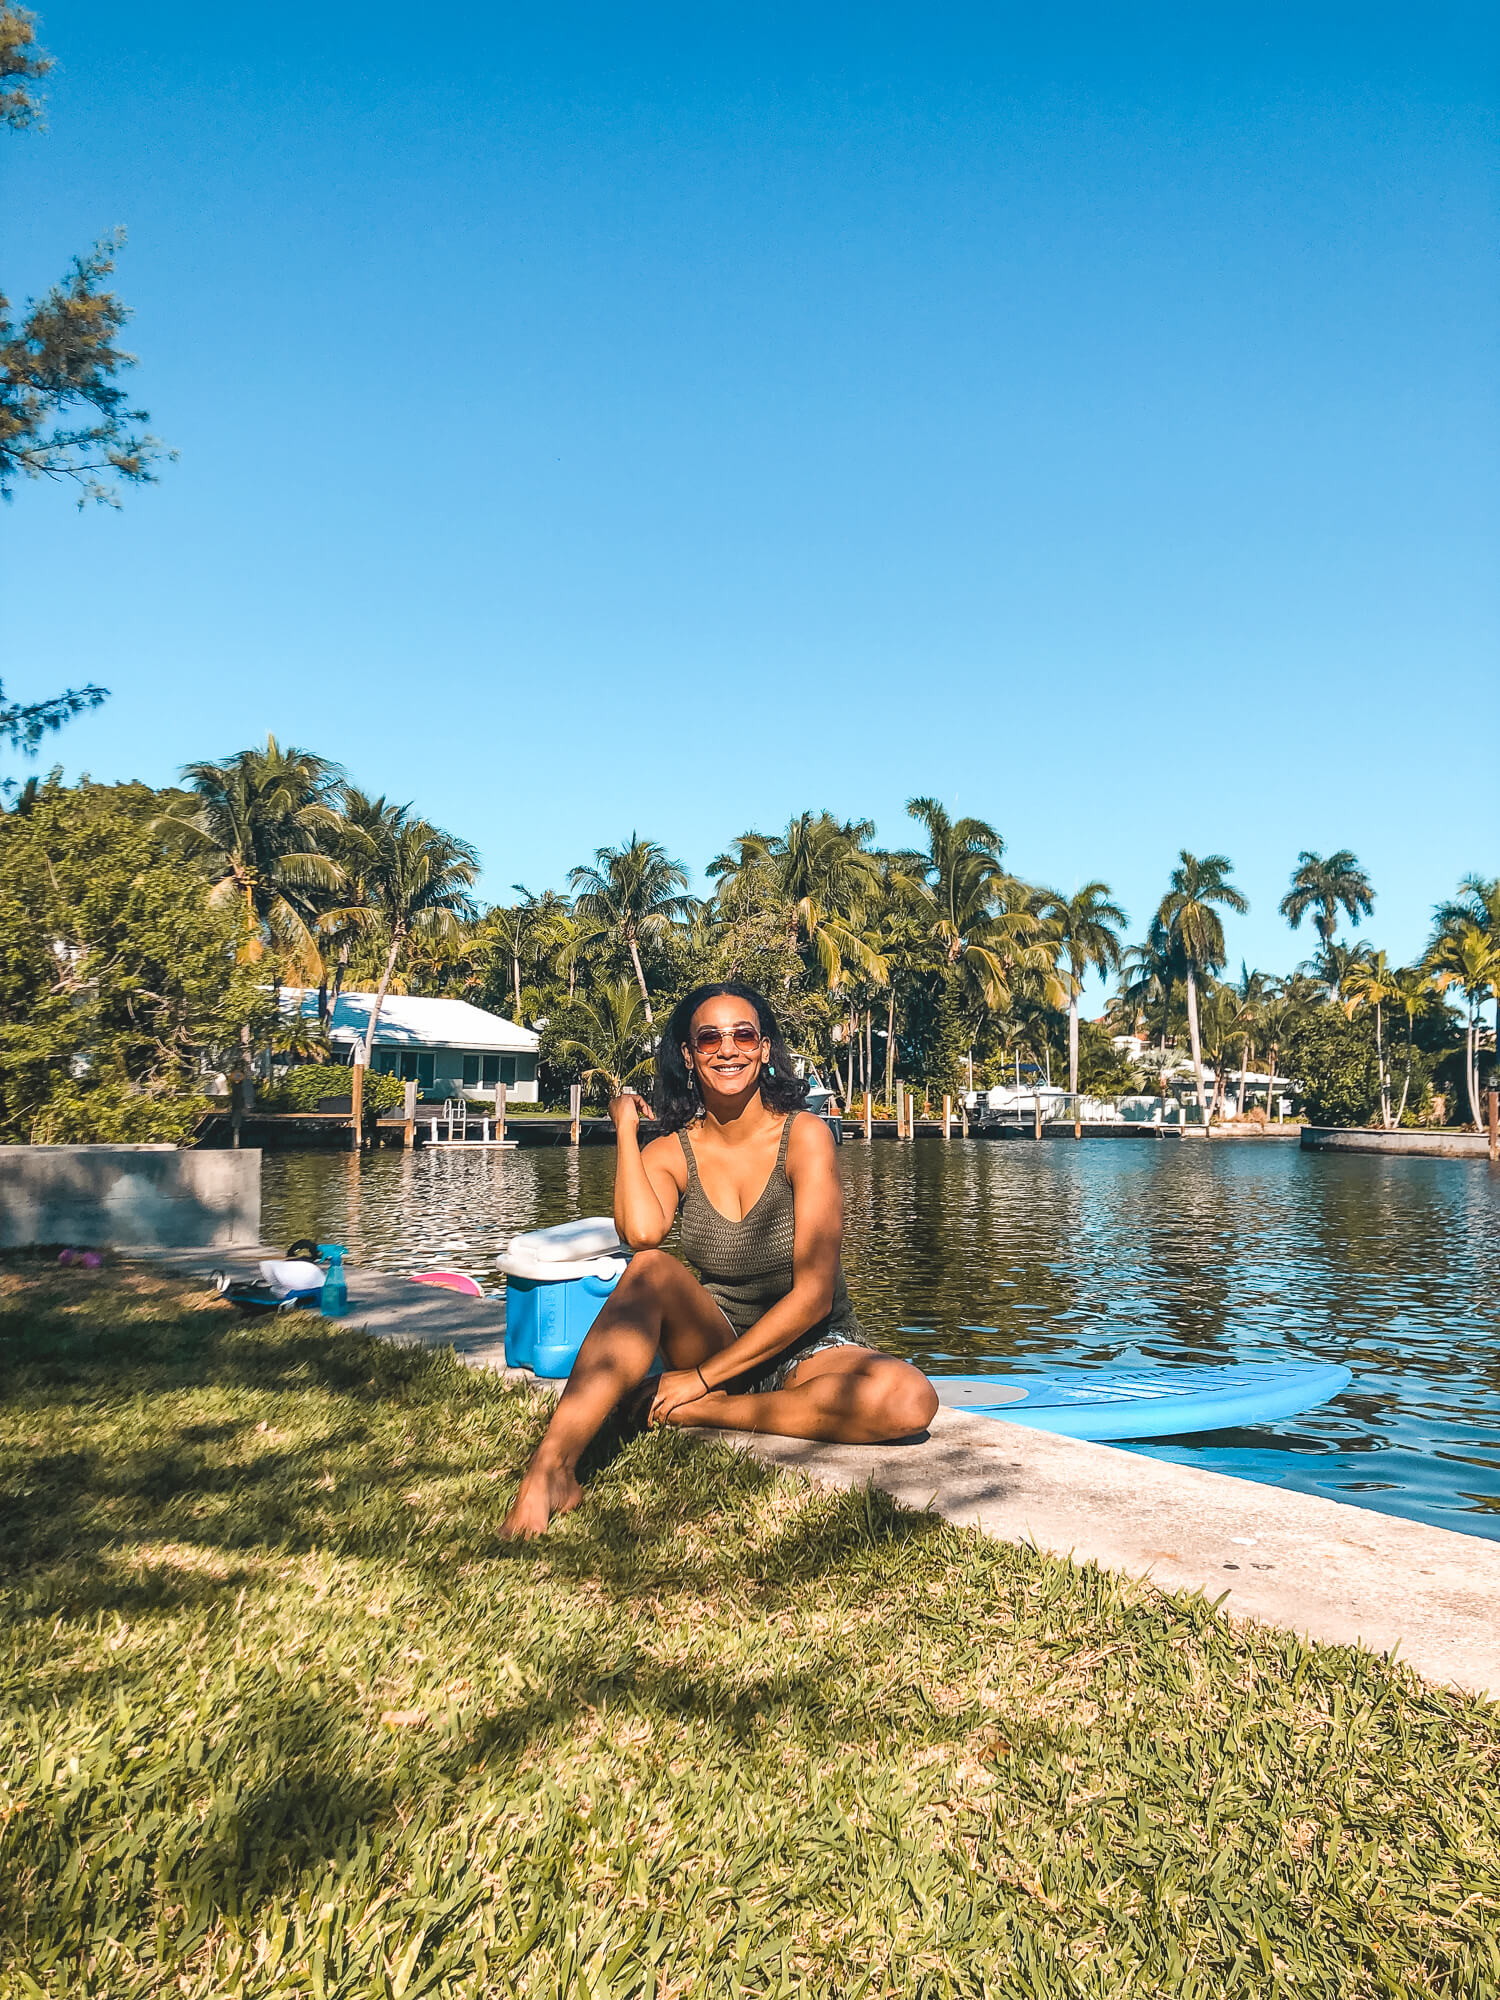 Fort Lauderdale Tours near Victoria Park - ochristine